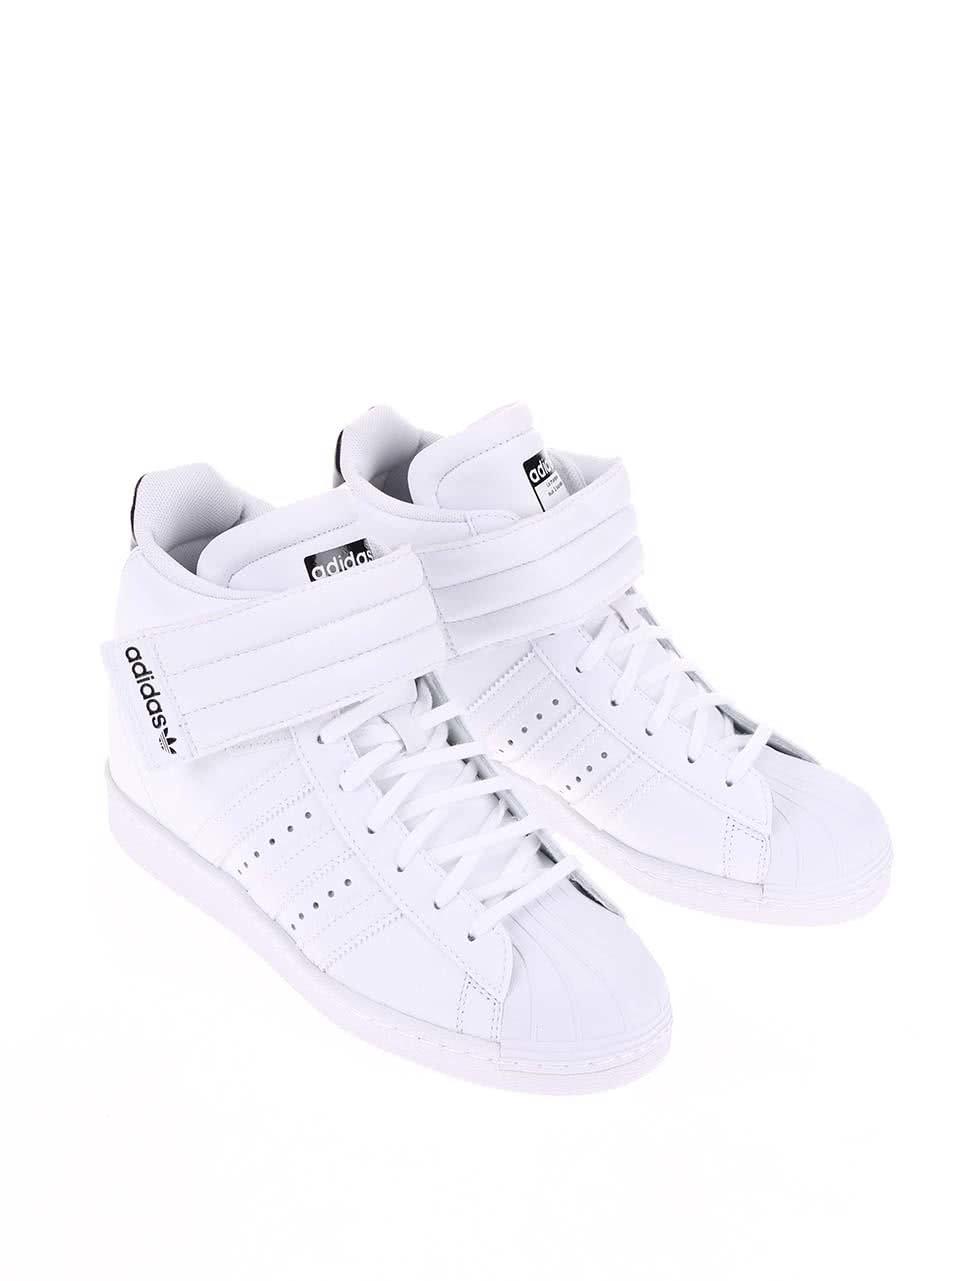 df6a09288b Biele dámske členkové tenisky adidas Originals Superstar UP Strap ...